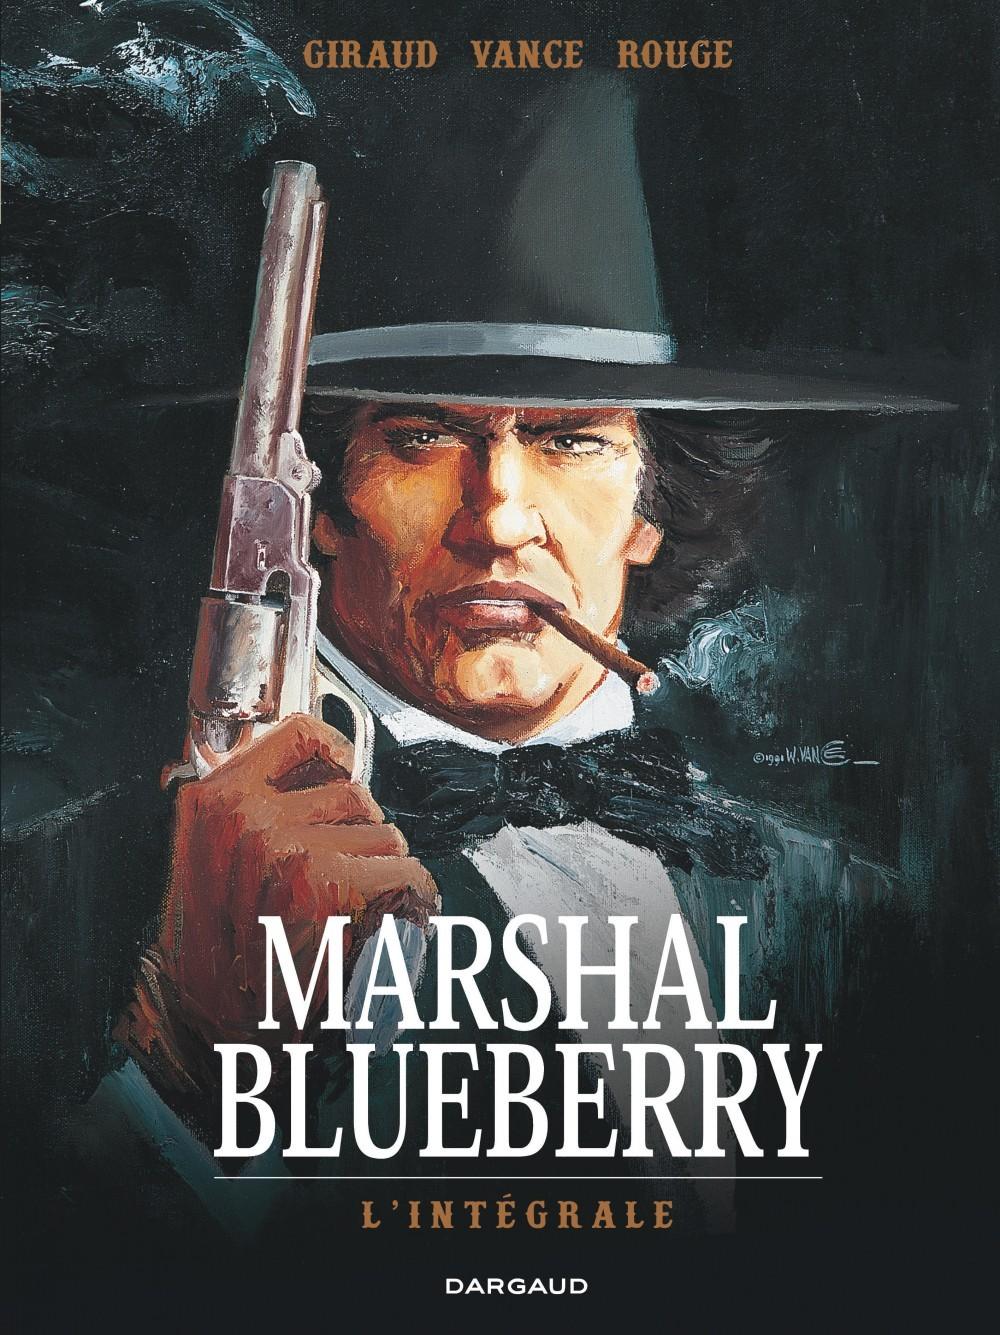 MARSHALL BLUEBERRY MARSHAL BLUEBERRY INTEGRAL